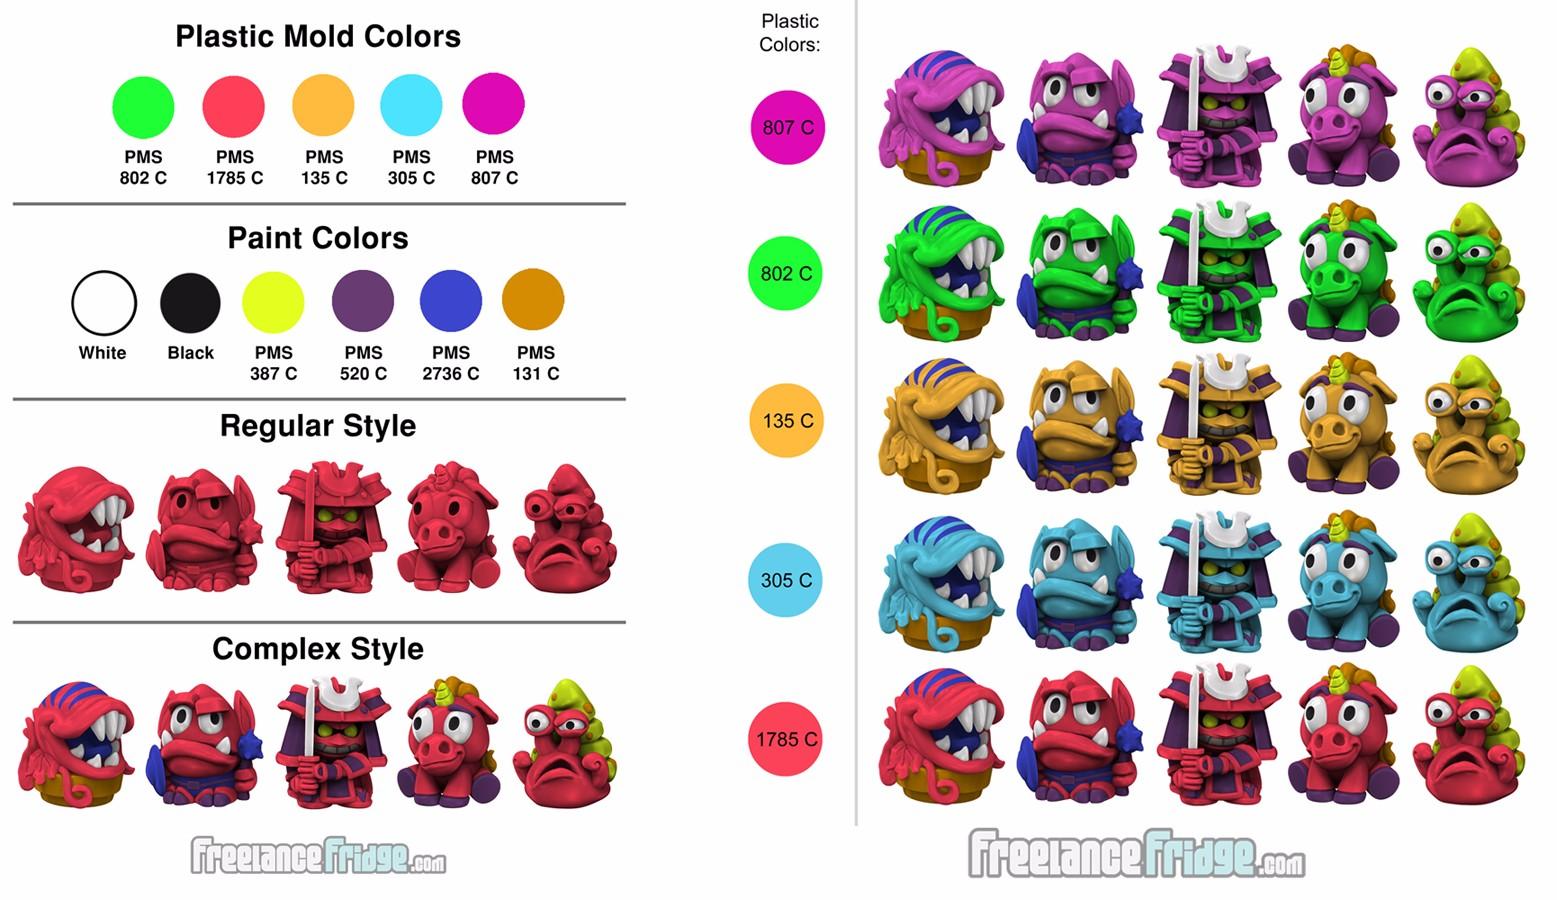 Fantasy SciFi Imaginative Cartoon Imagiminis Set 2 Toy Figurines Paint and Plastic Colors